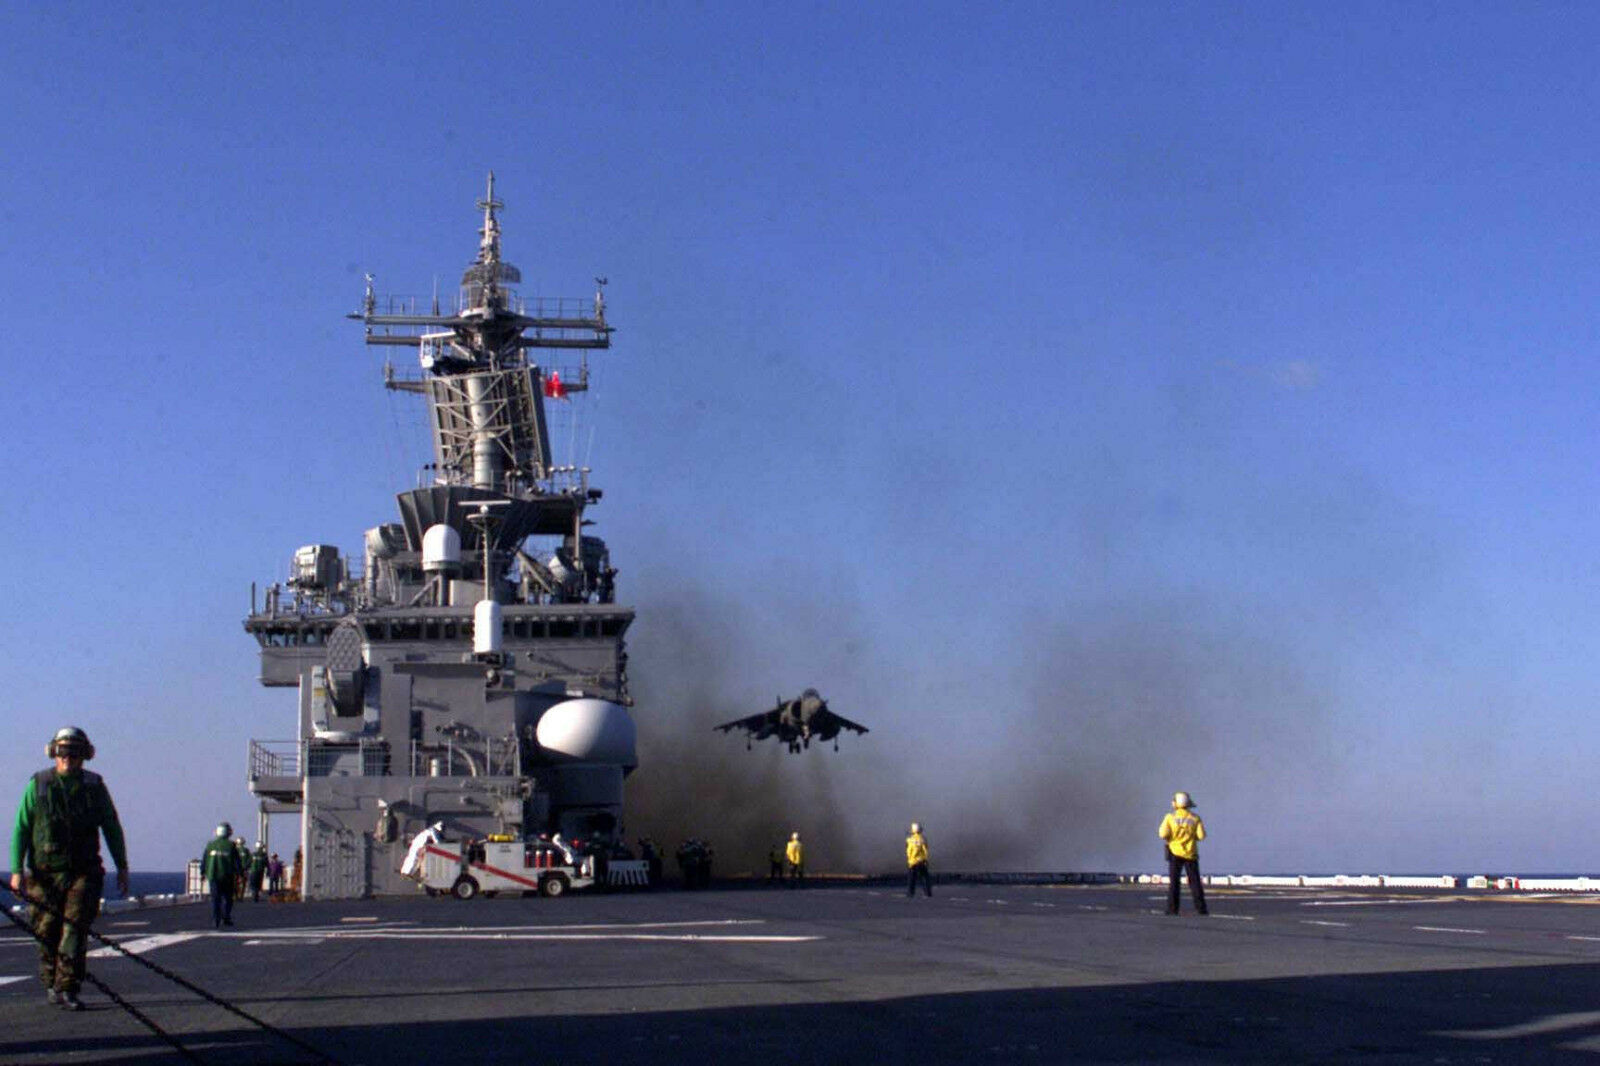 USS BOXER LHD-4 PATCH US NAVY Amphibious Warfare Assault Ship PIN UP USN VETERAN